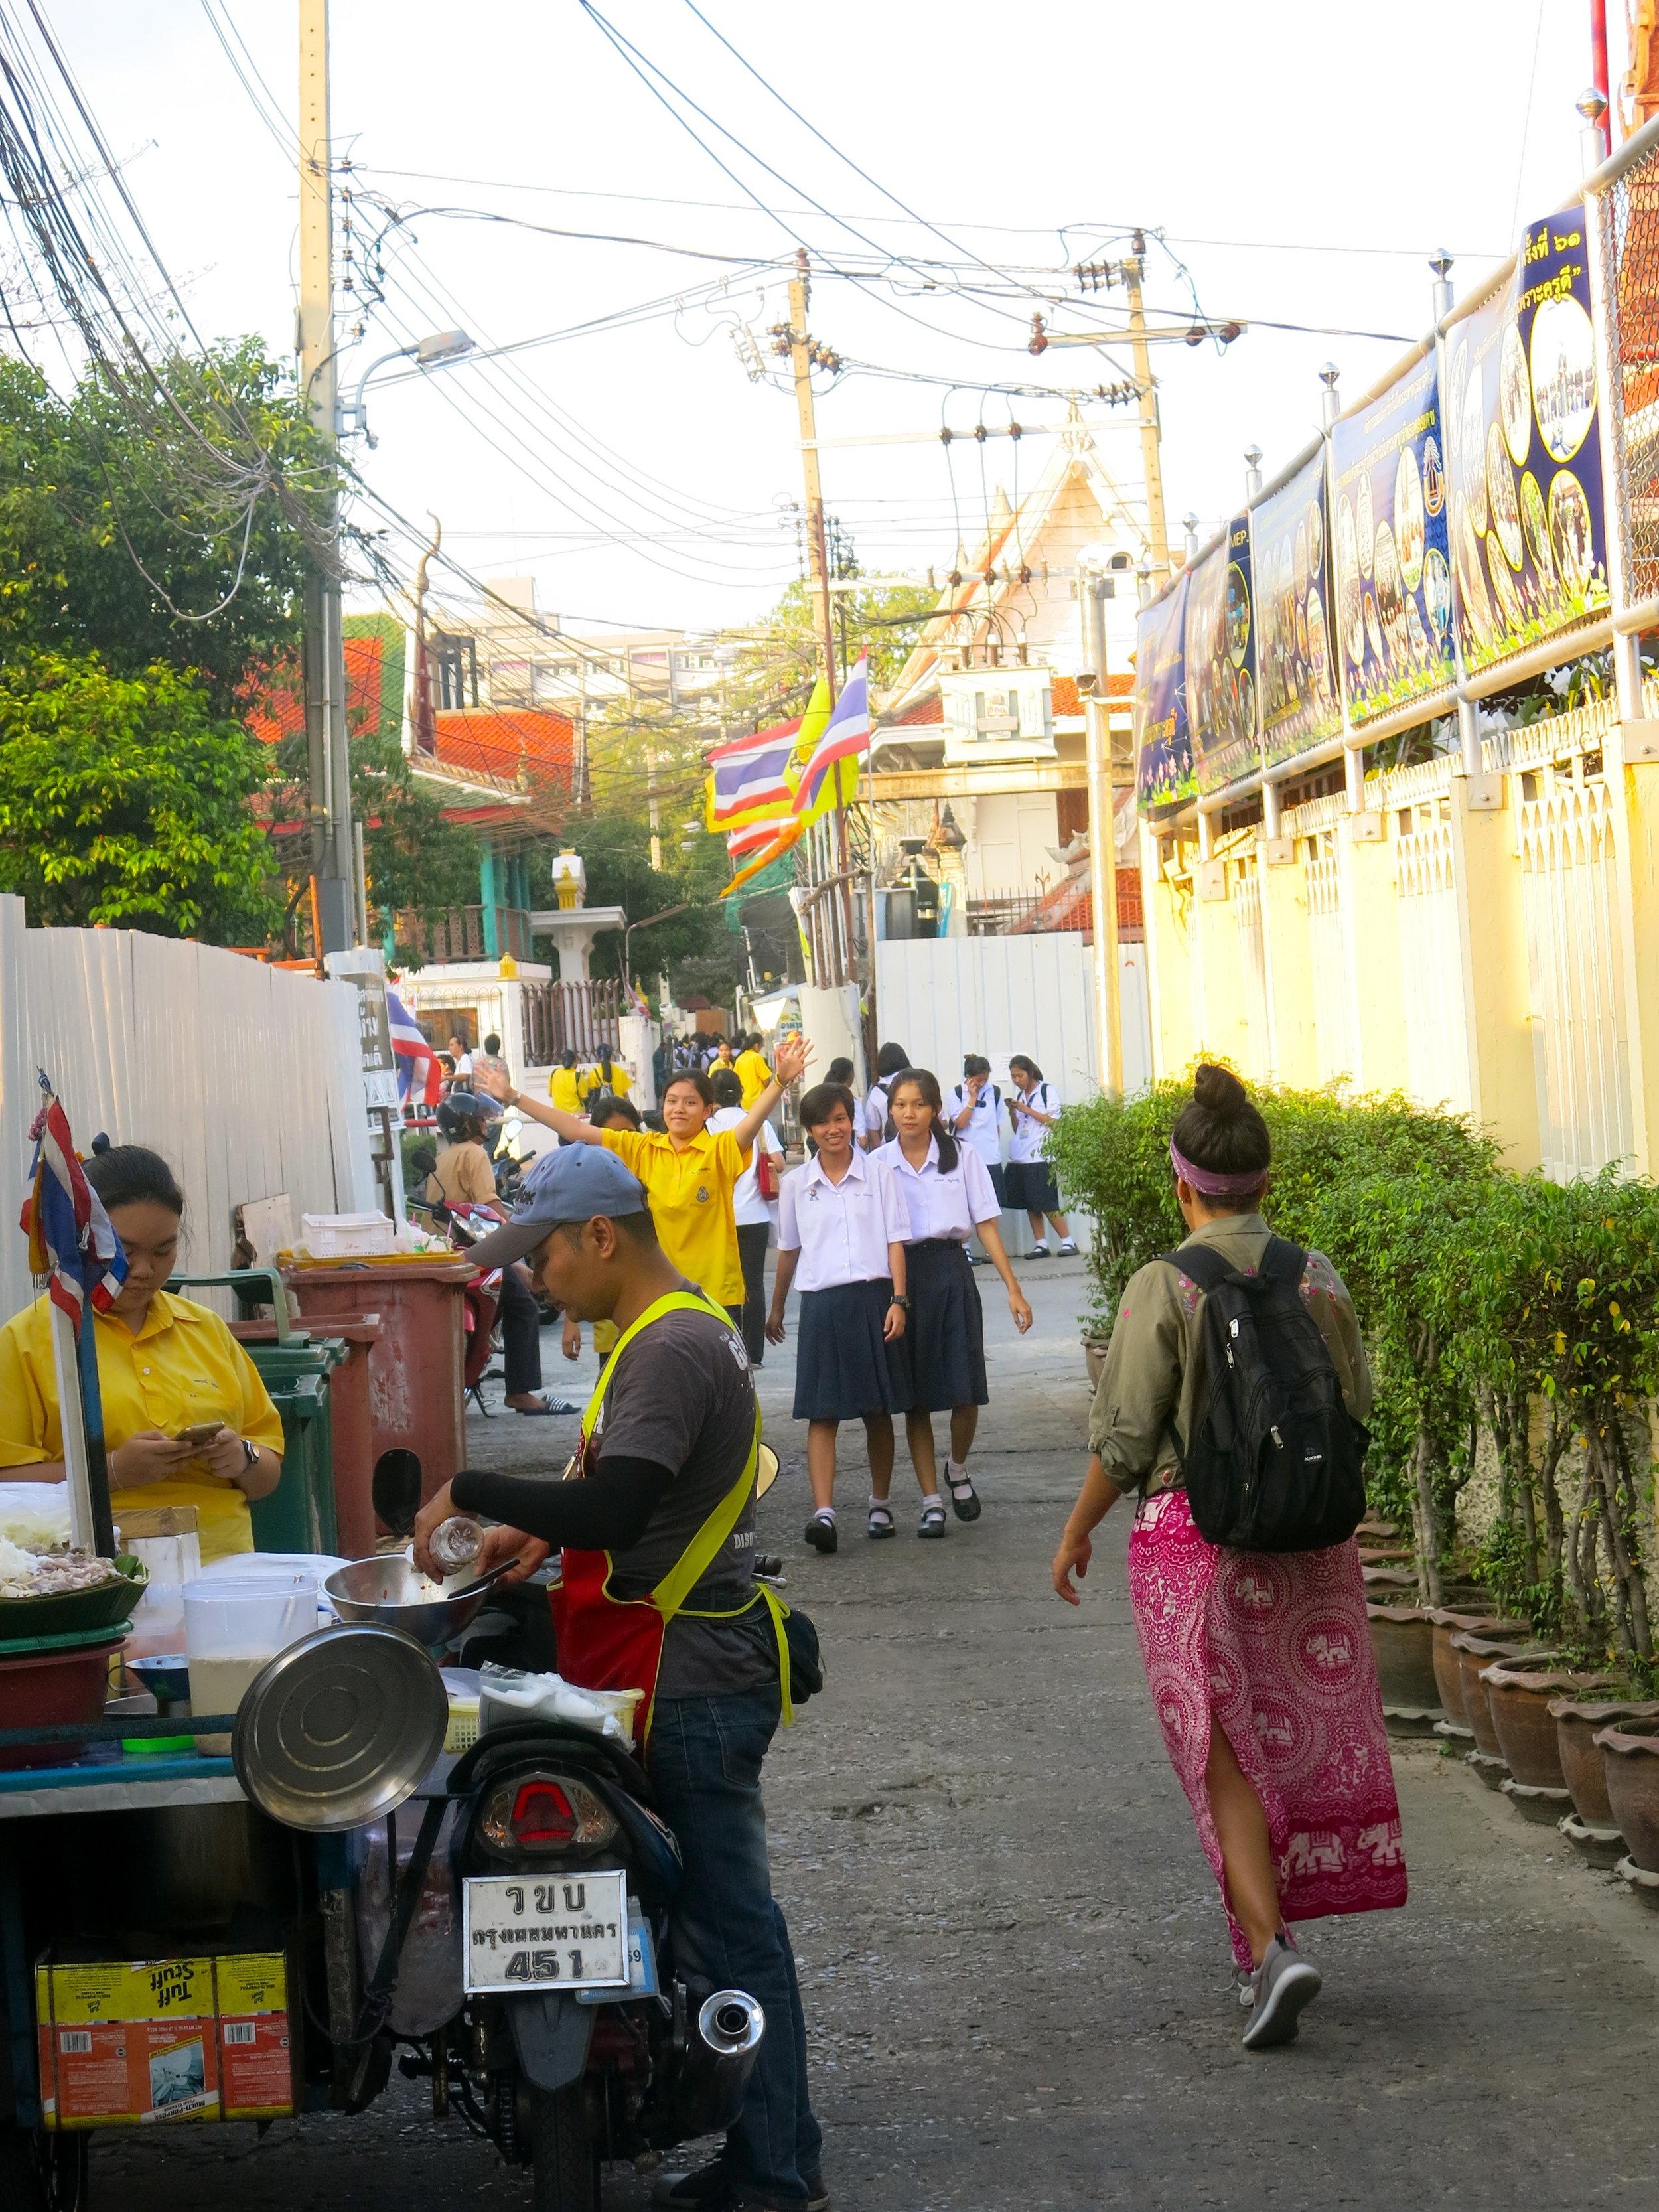 Street scene of Thonburi